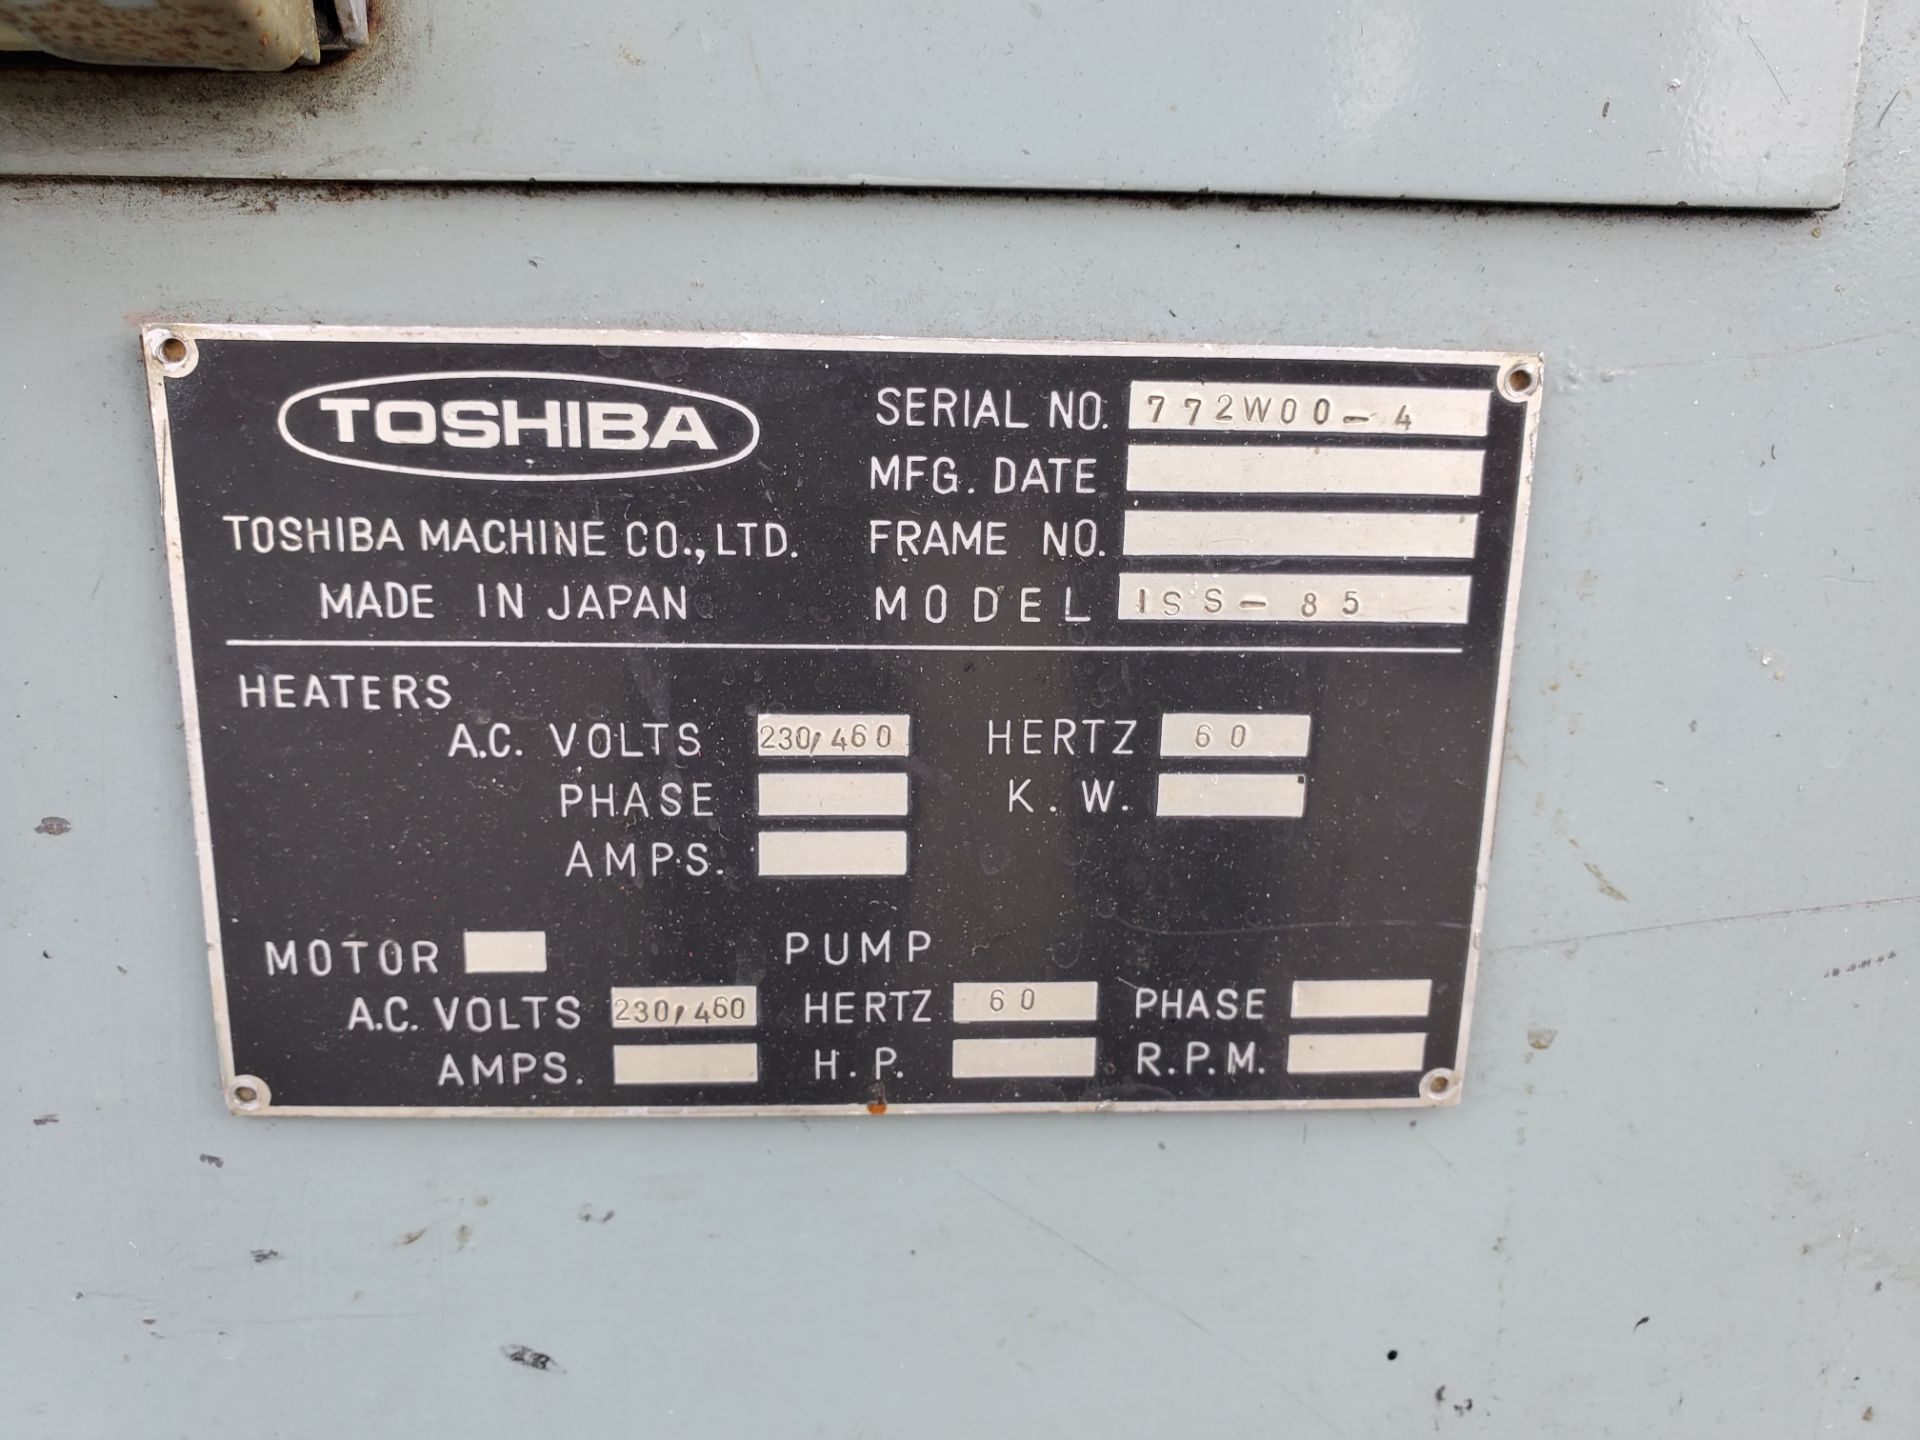 TOSHIBA ISS-85 INJECTION MOLDING MACHINE - Image 3 of 4